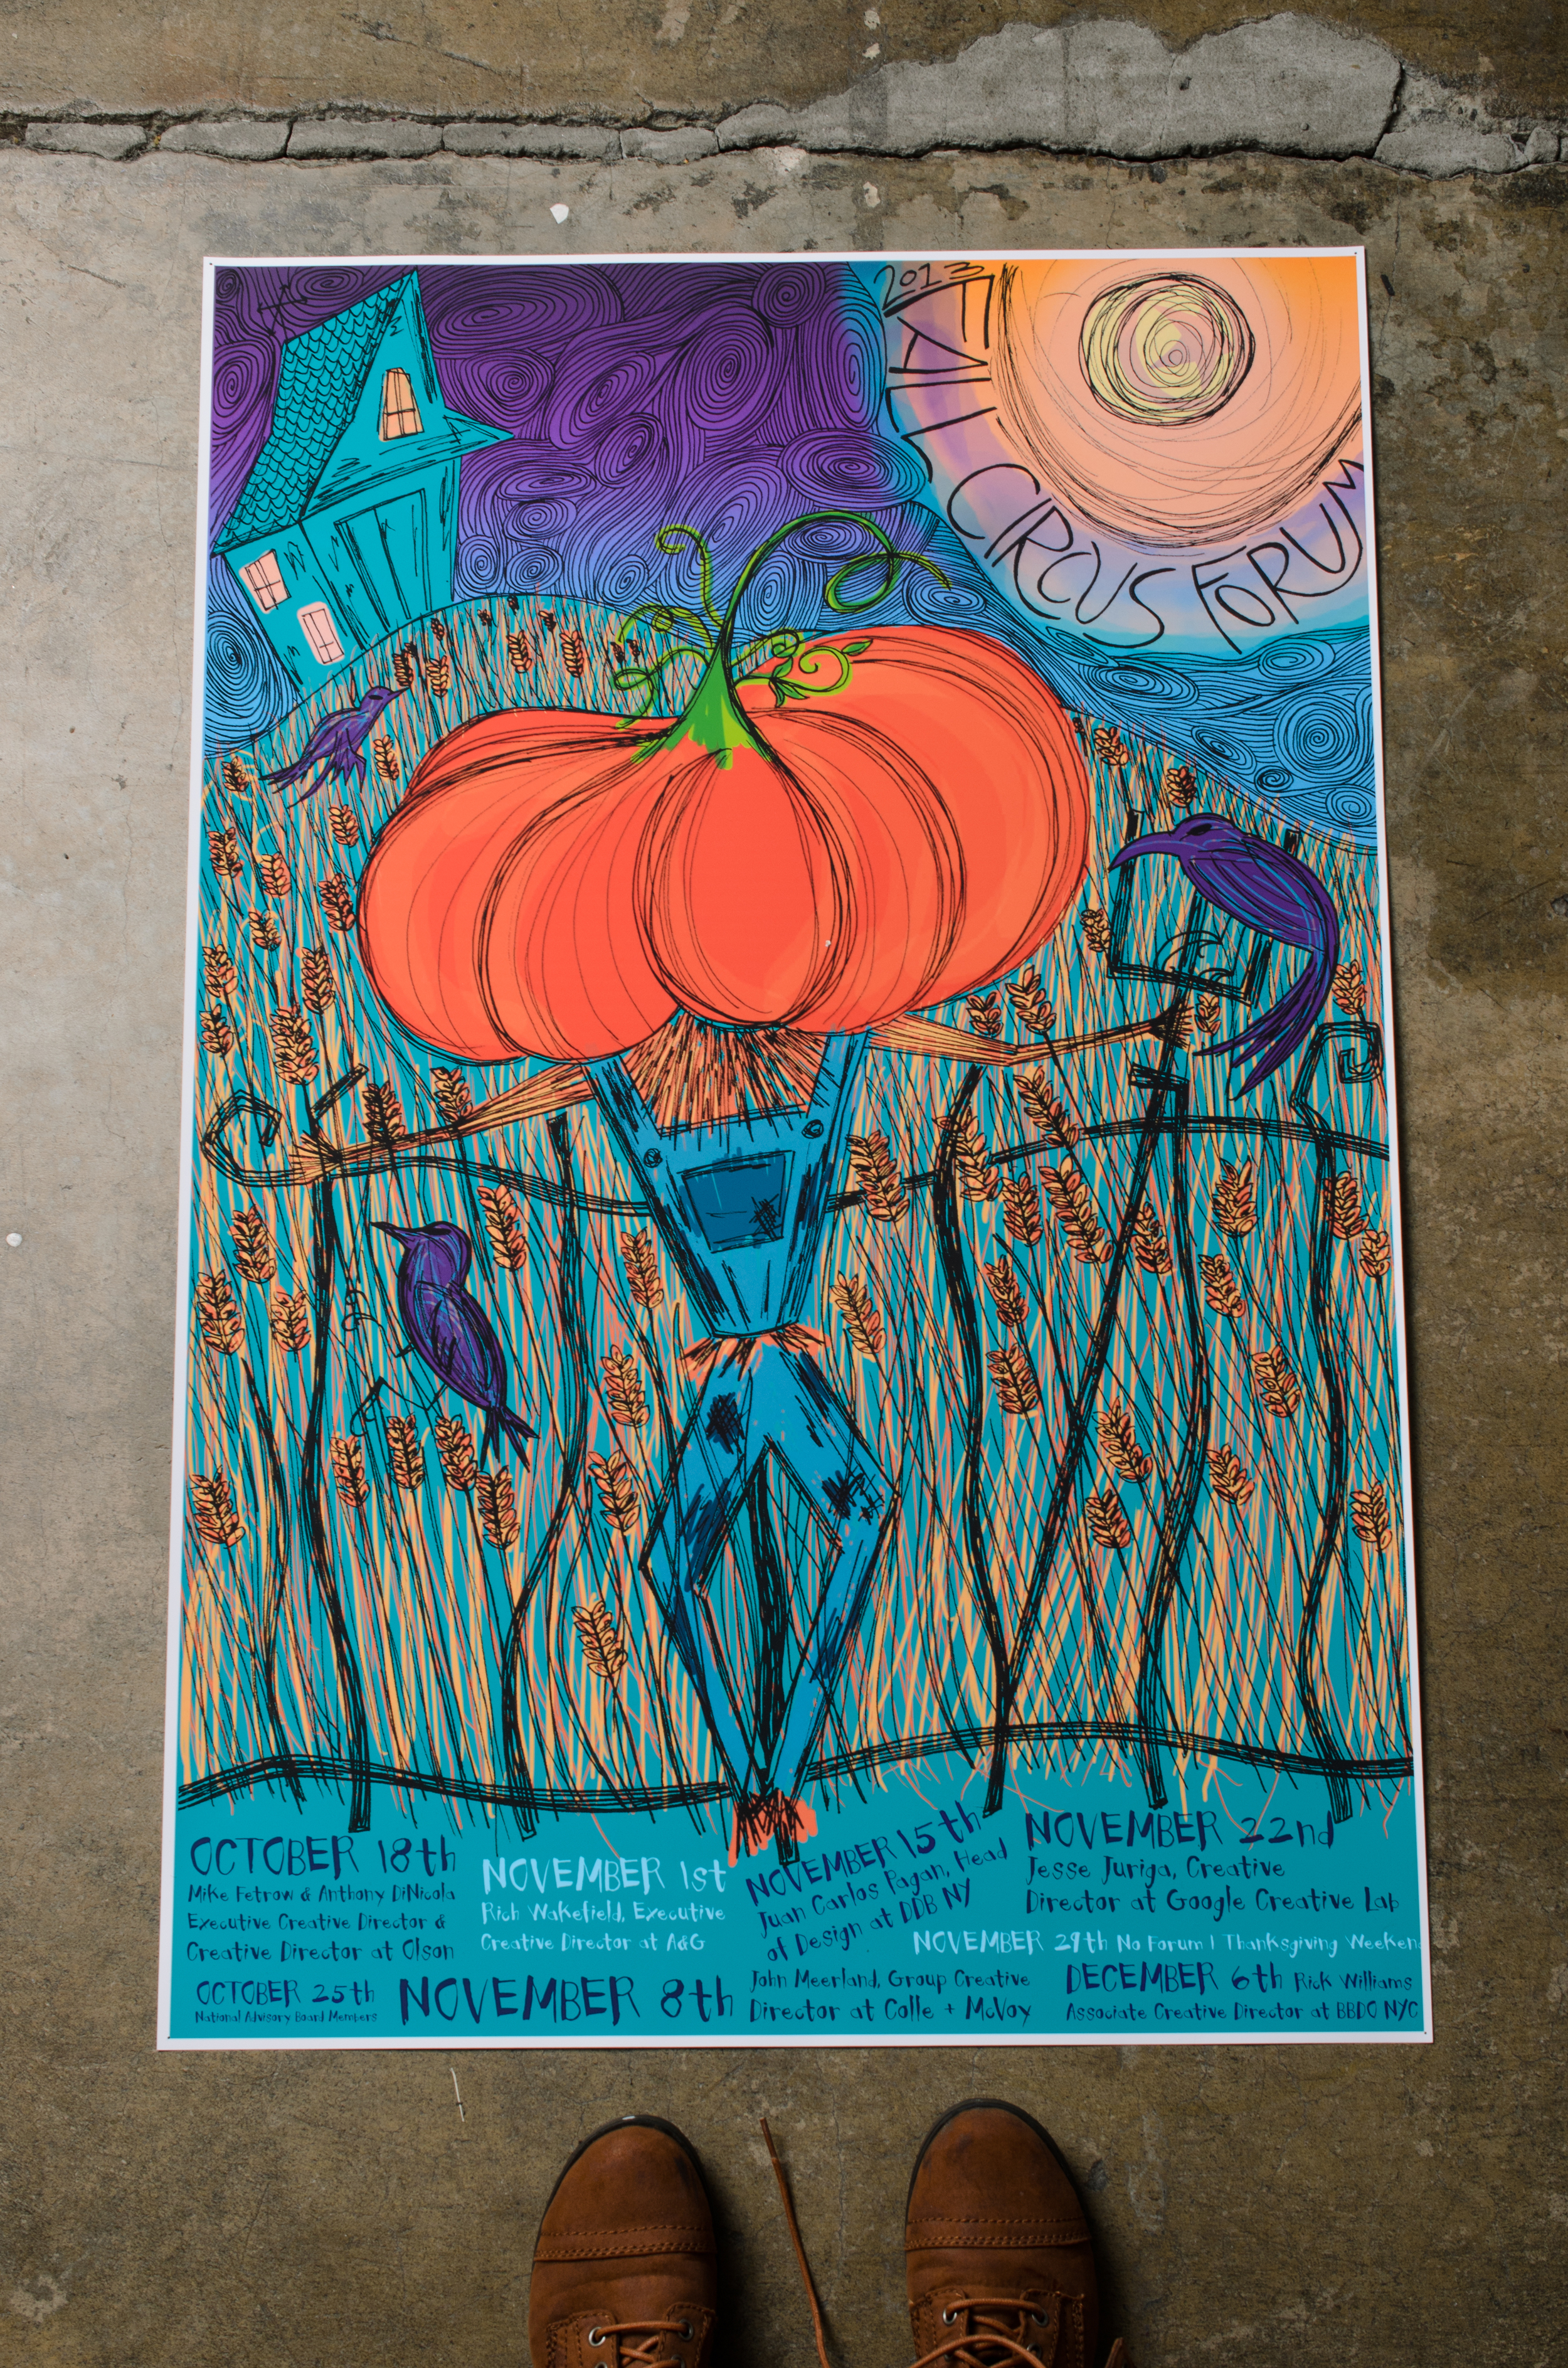 Creative Circus Fall Forum Poster